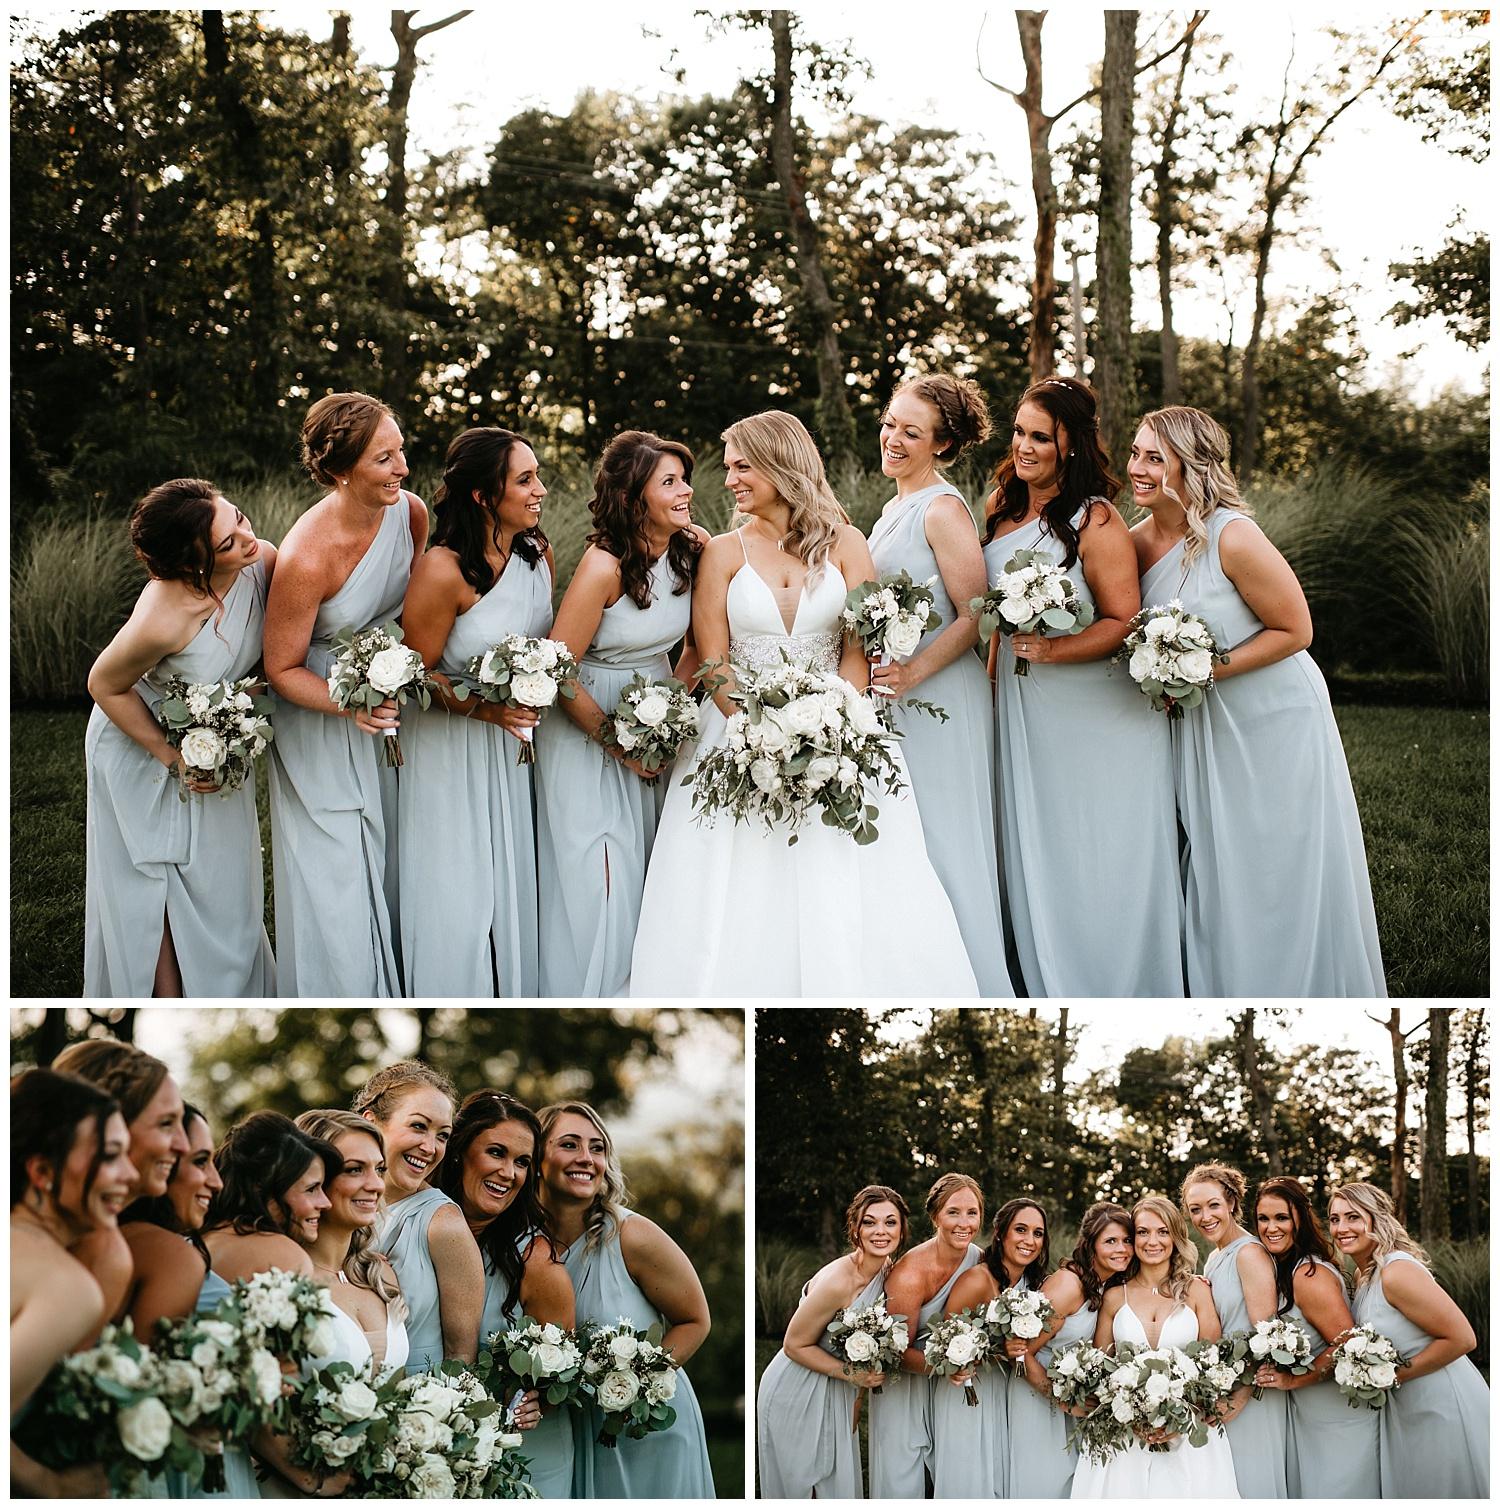 Destination-Wedding-Photographer-in-NEPA-Palmerton-PA_0011.jpg